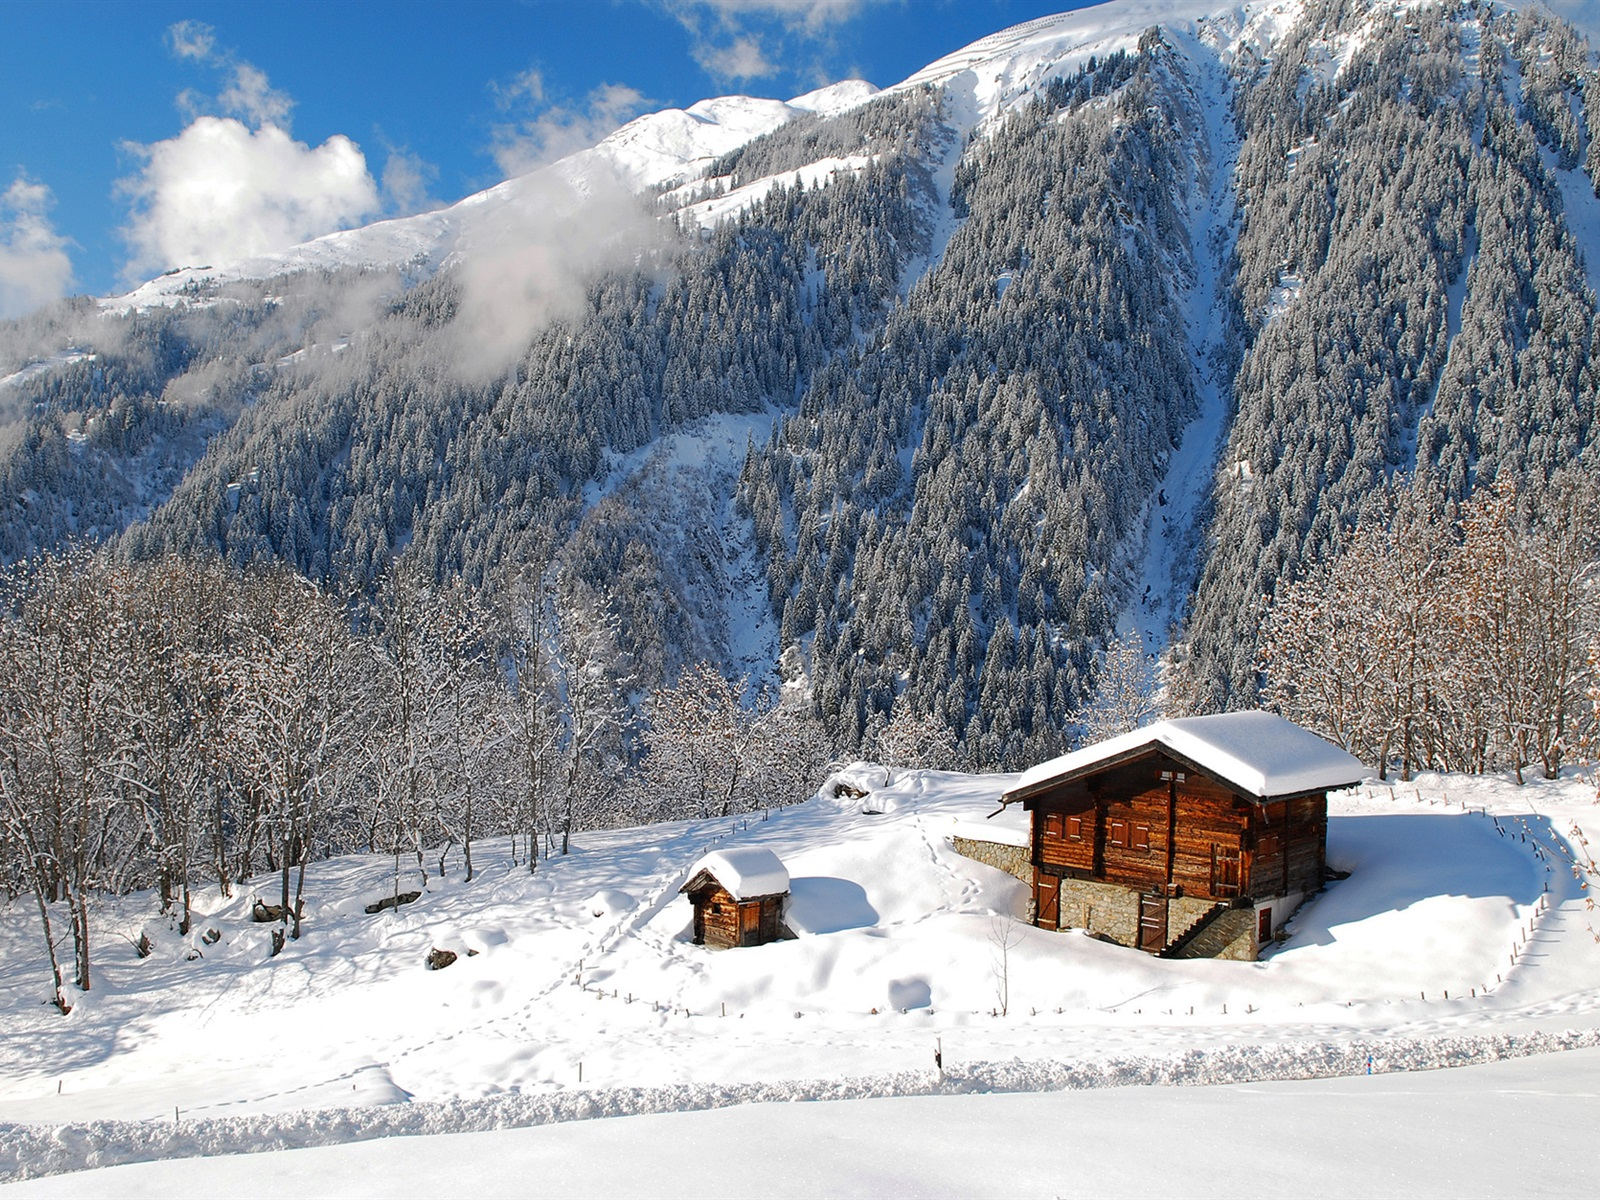 Wallpaper Winter, Forest, Landscape HD, Picture, Image